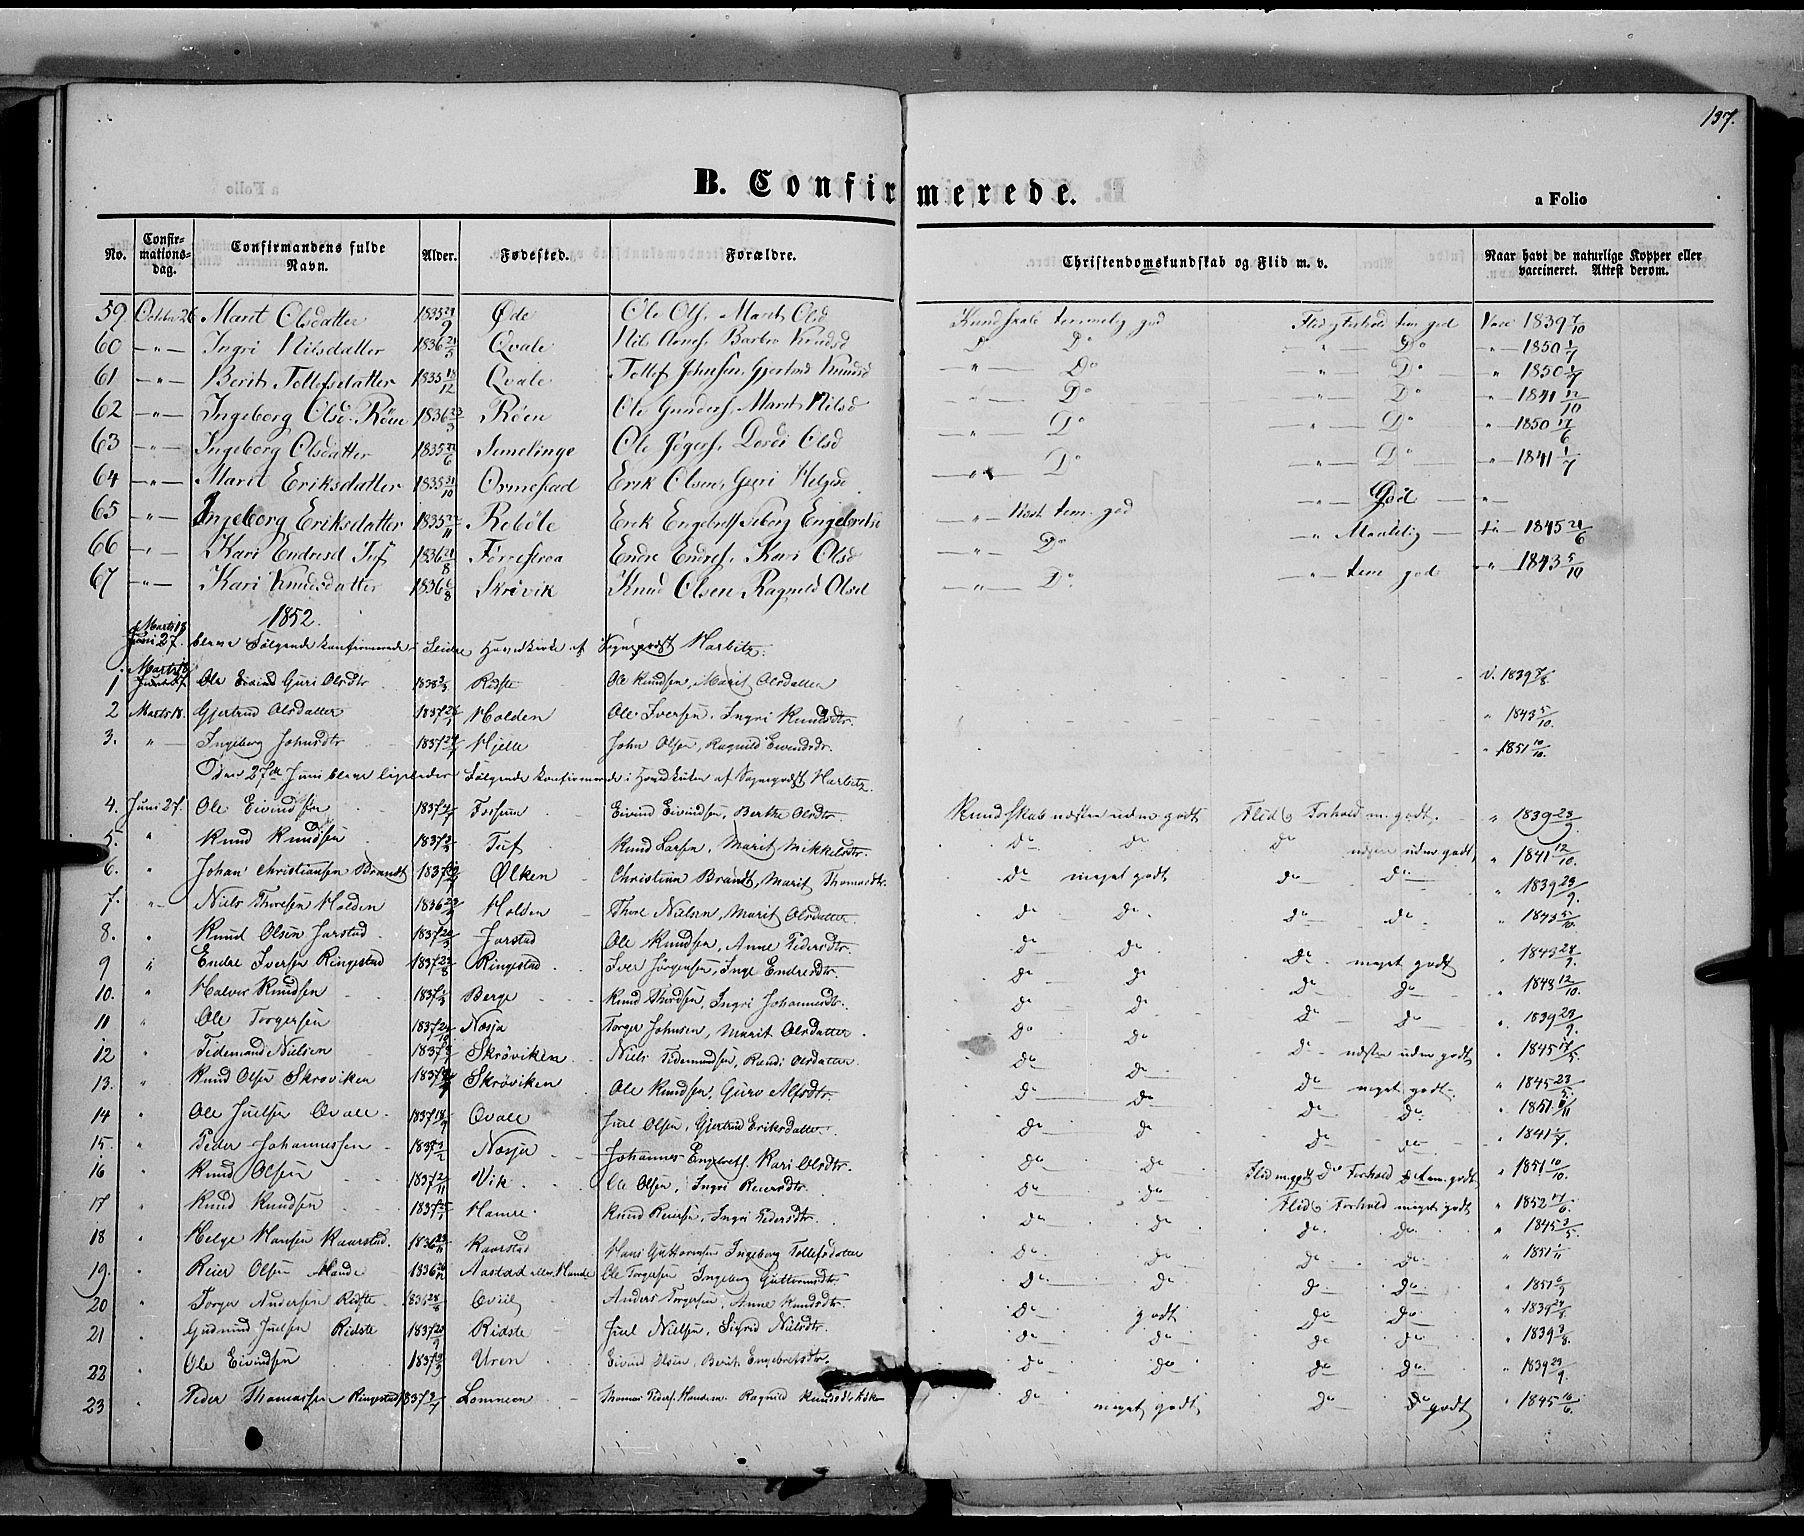 SAH, Vestre Slidre prestekontor, Ministerialbok nr. 1, 1844-1855, s. 137